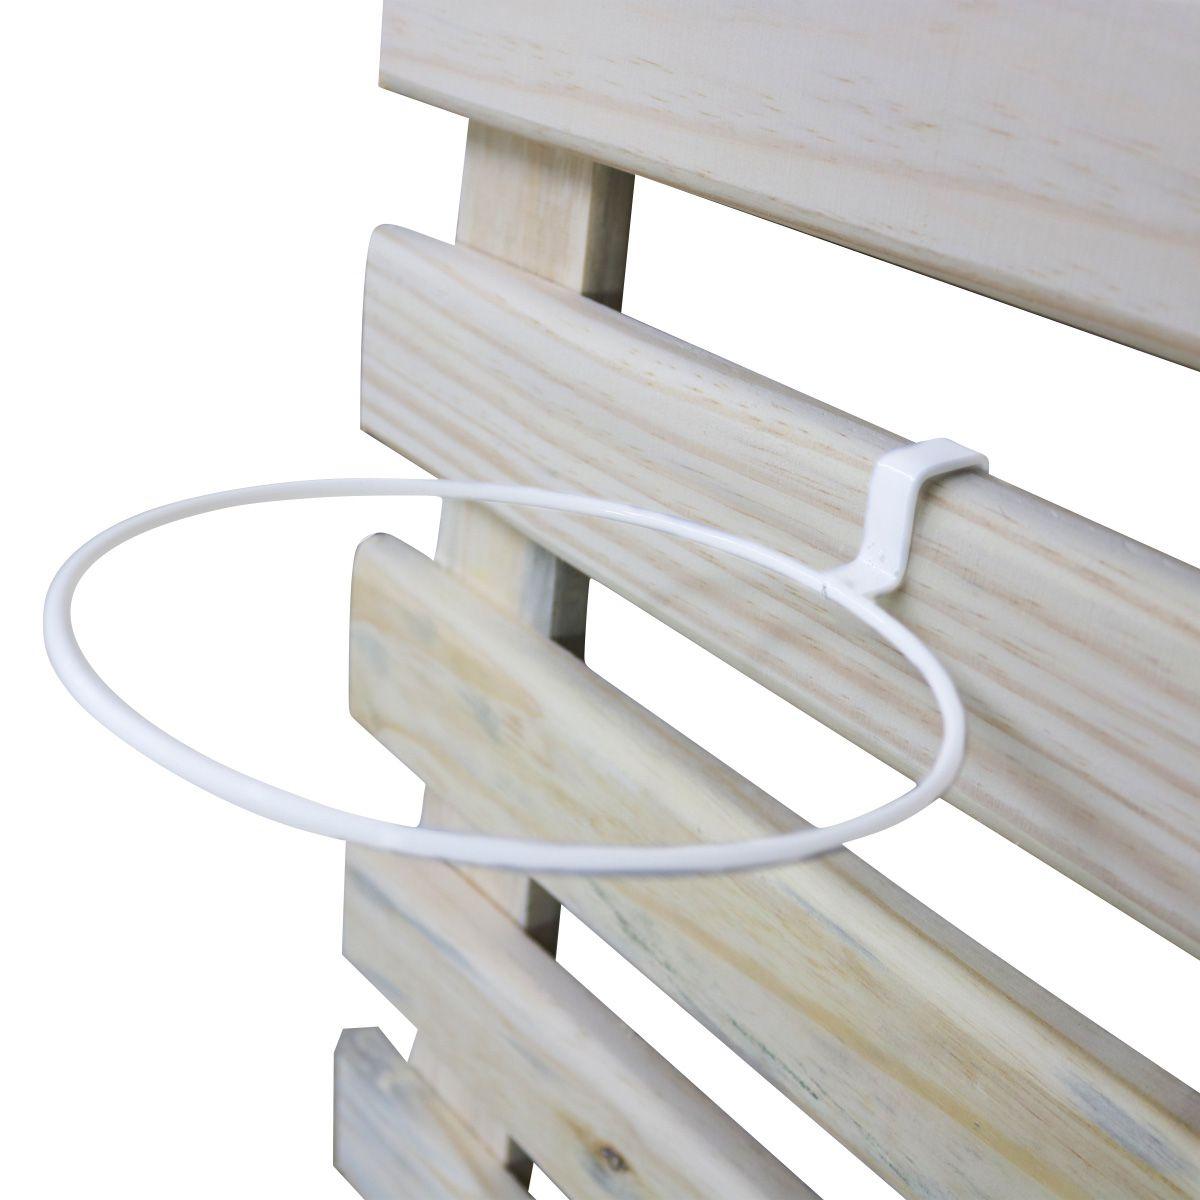 Suporte de Treliça Branco para Vaso Autoirrigável Pequeno RAIZ